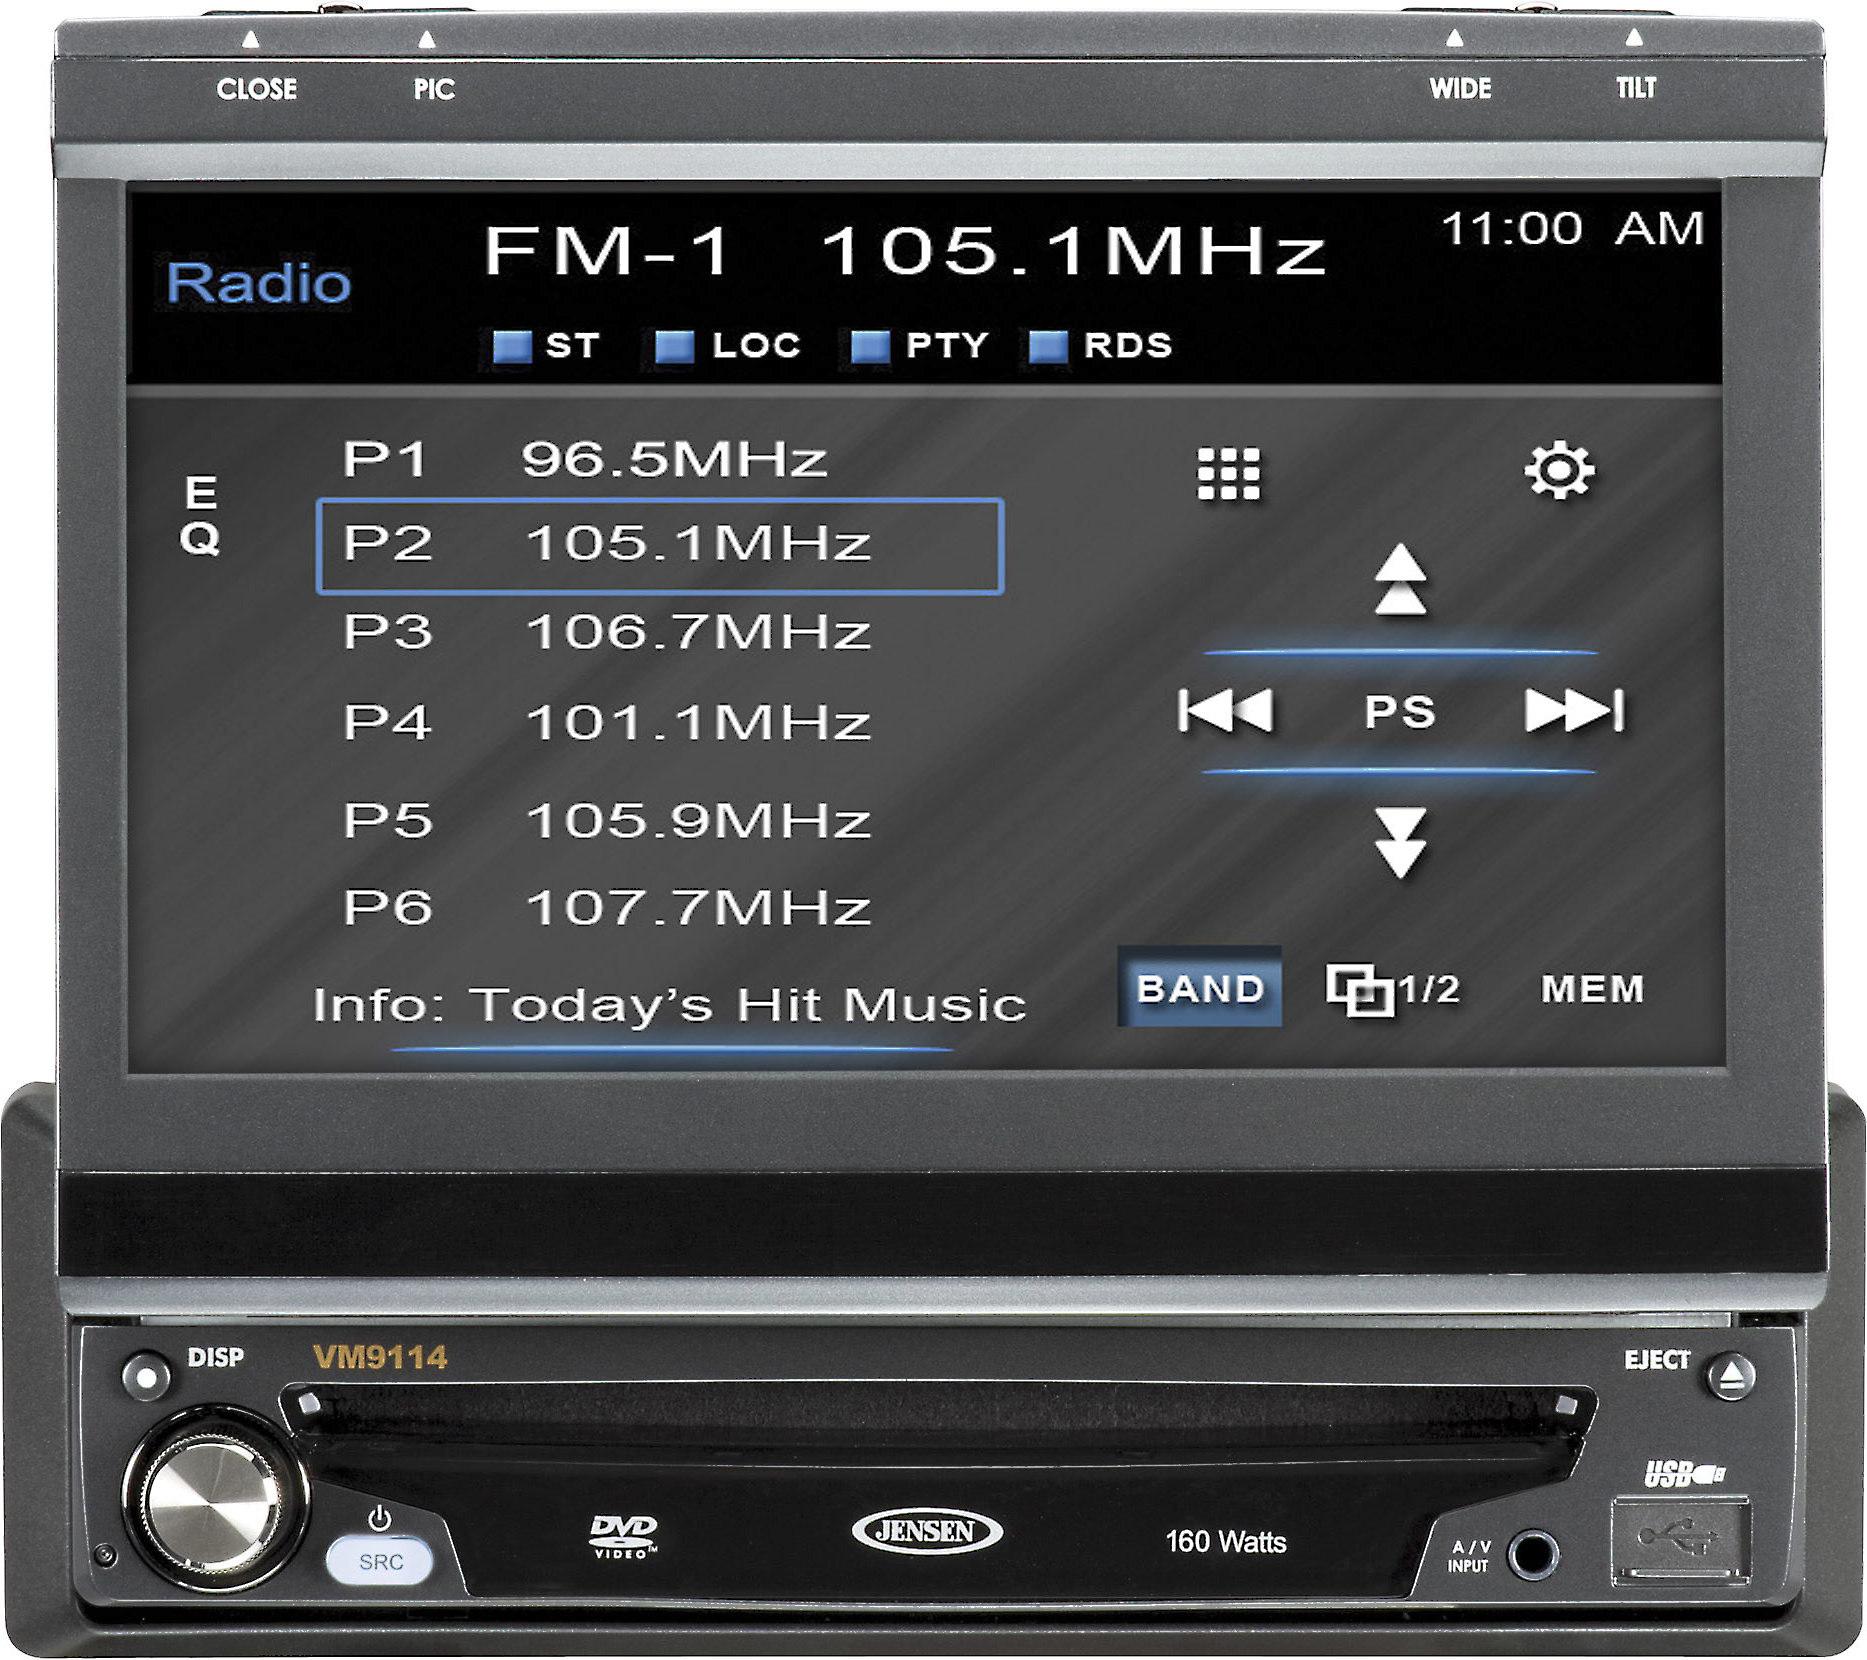 Jensen Car Stereo | Wiring Diagram on jensen car audio, jvc car audio wiring diagram, jensen marine stereo wiring diagram, jensen car speakers, jensen car stereo remote control, jensen car stereo manuals,